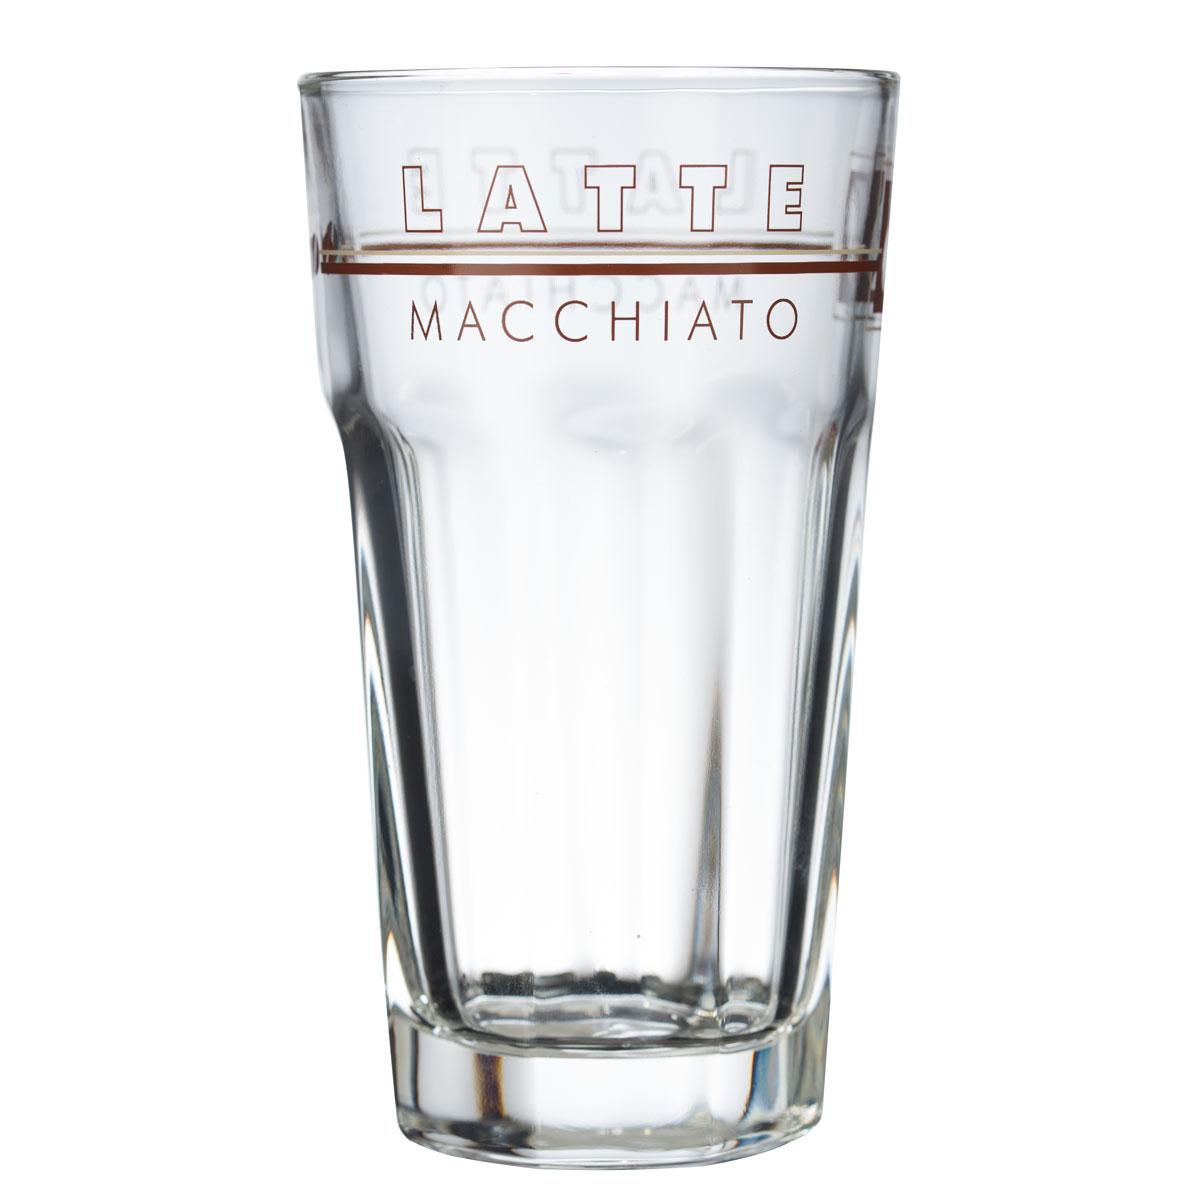 4 latte macchiato gl ser rastal 340 ml macchiato glas kaffeegl ser motiv glas ebay. Black Bedroom Furniture Sets. Home Design Ideas